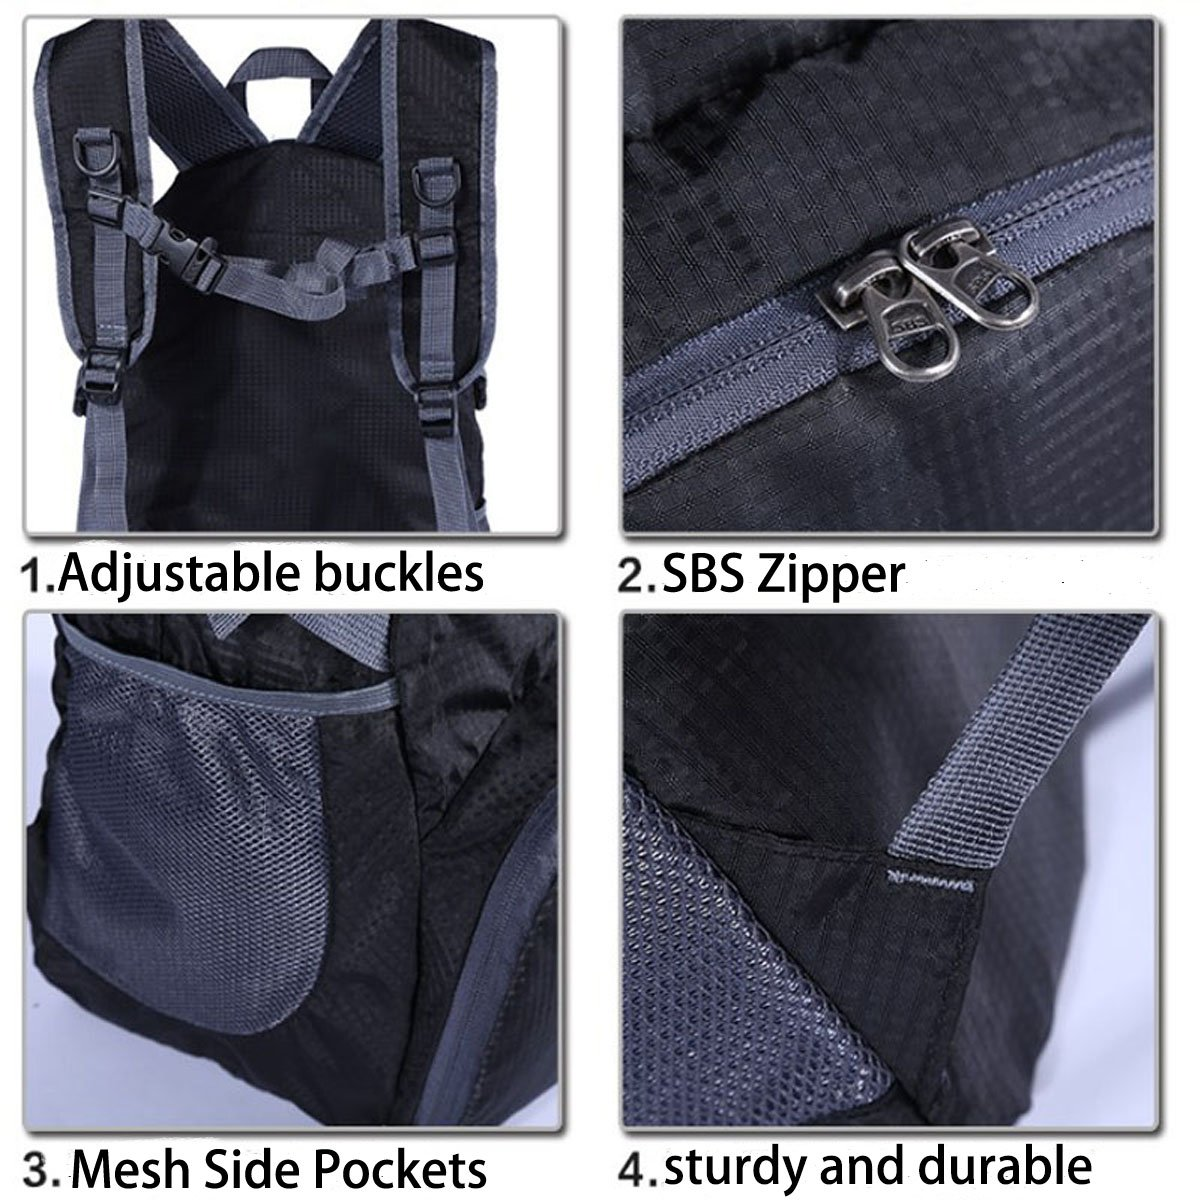 FW-US-TBP01/_FF FlowFly Travel Hiking Backpack Unisex Rated 35L Lightweight Waterproof Handy Daypack Flowish Inc